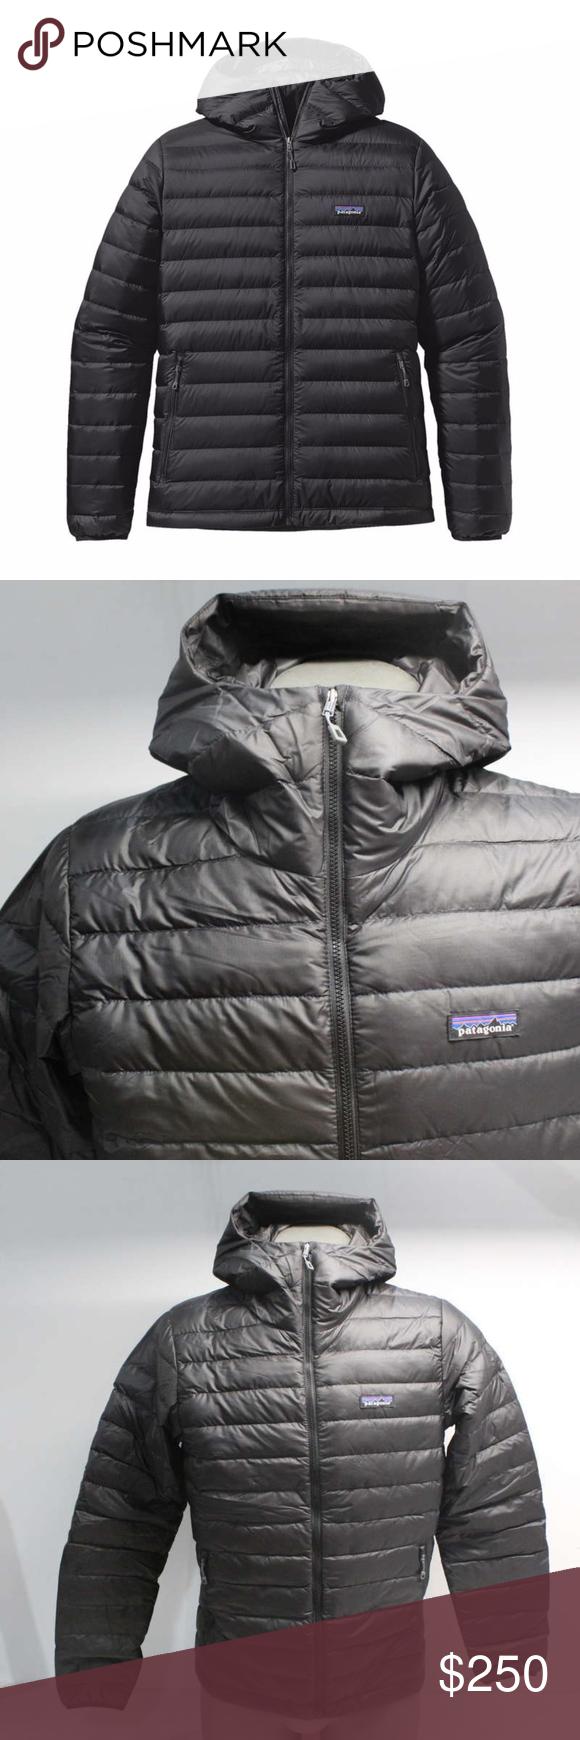 Nwt Patagonia Black Sweater Down Puffer Jacket Jackets Black Sweaters Puffer Jackets [ 1740 x 580 Pixel ]